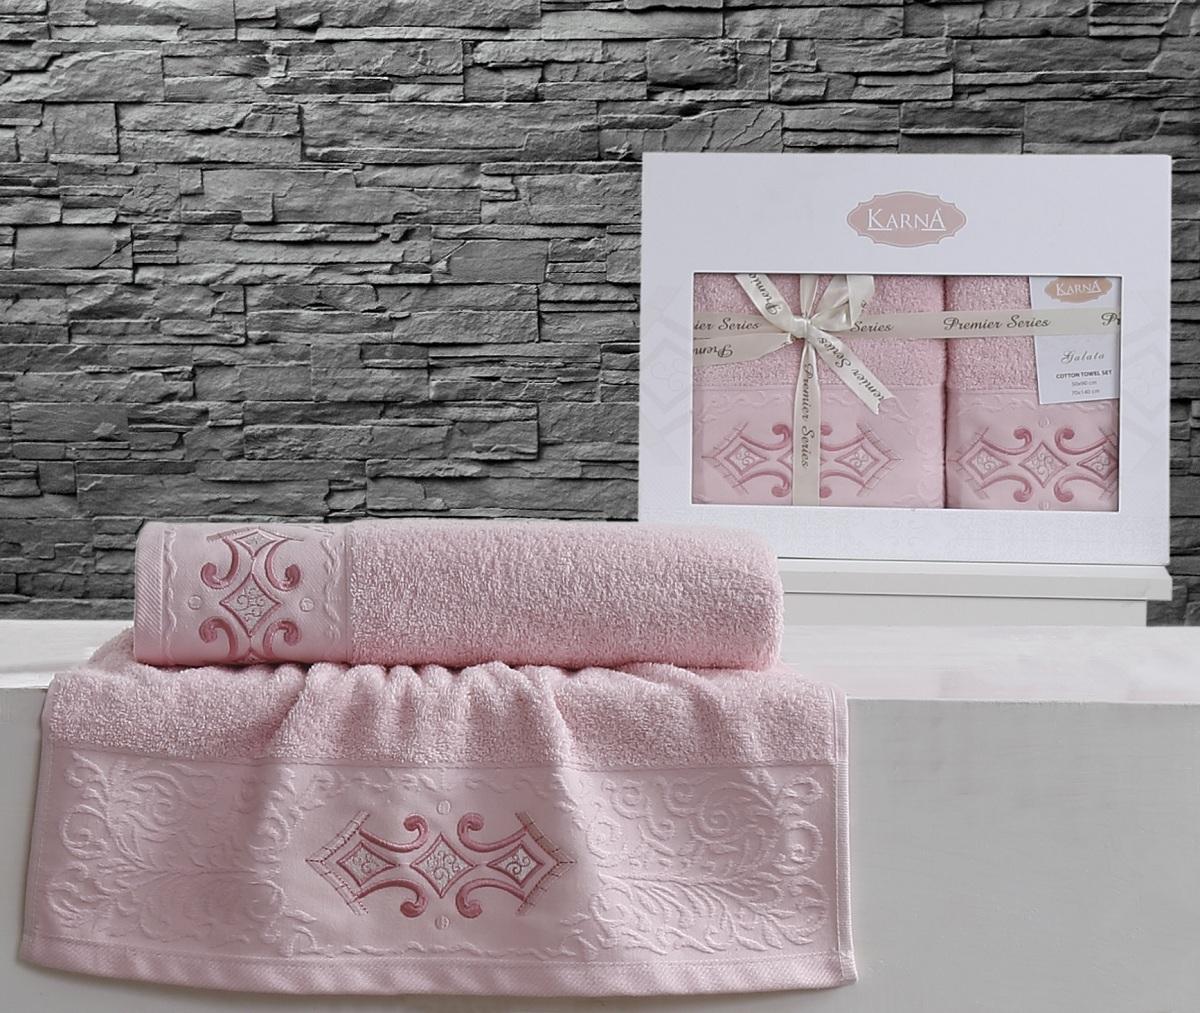 Полотенца Karna Полотенце Galata Цвет: Розовый (Набор) наматрасник karna с пропиткой 120x200 см